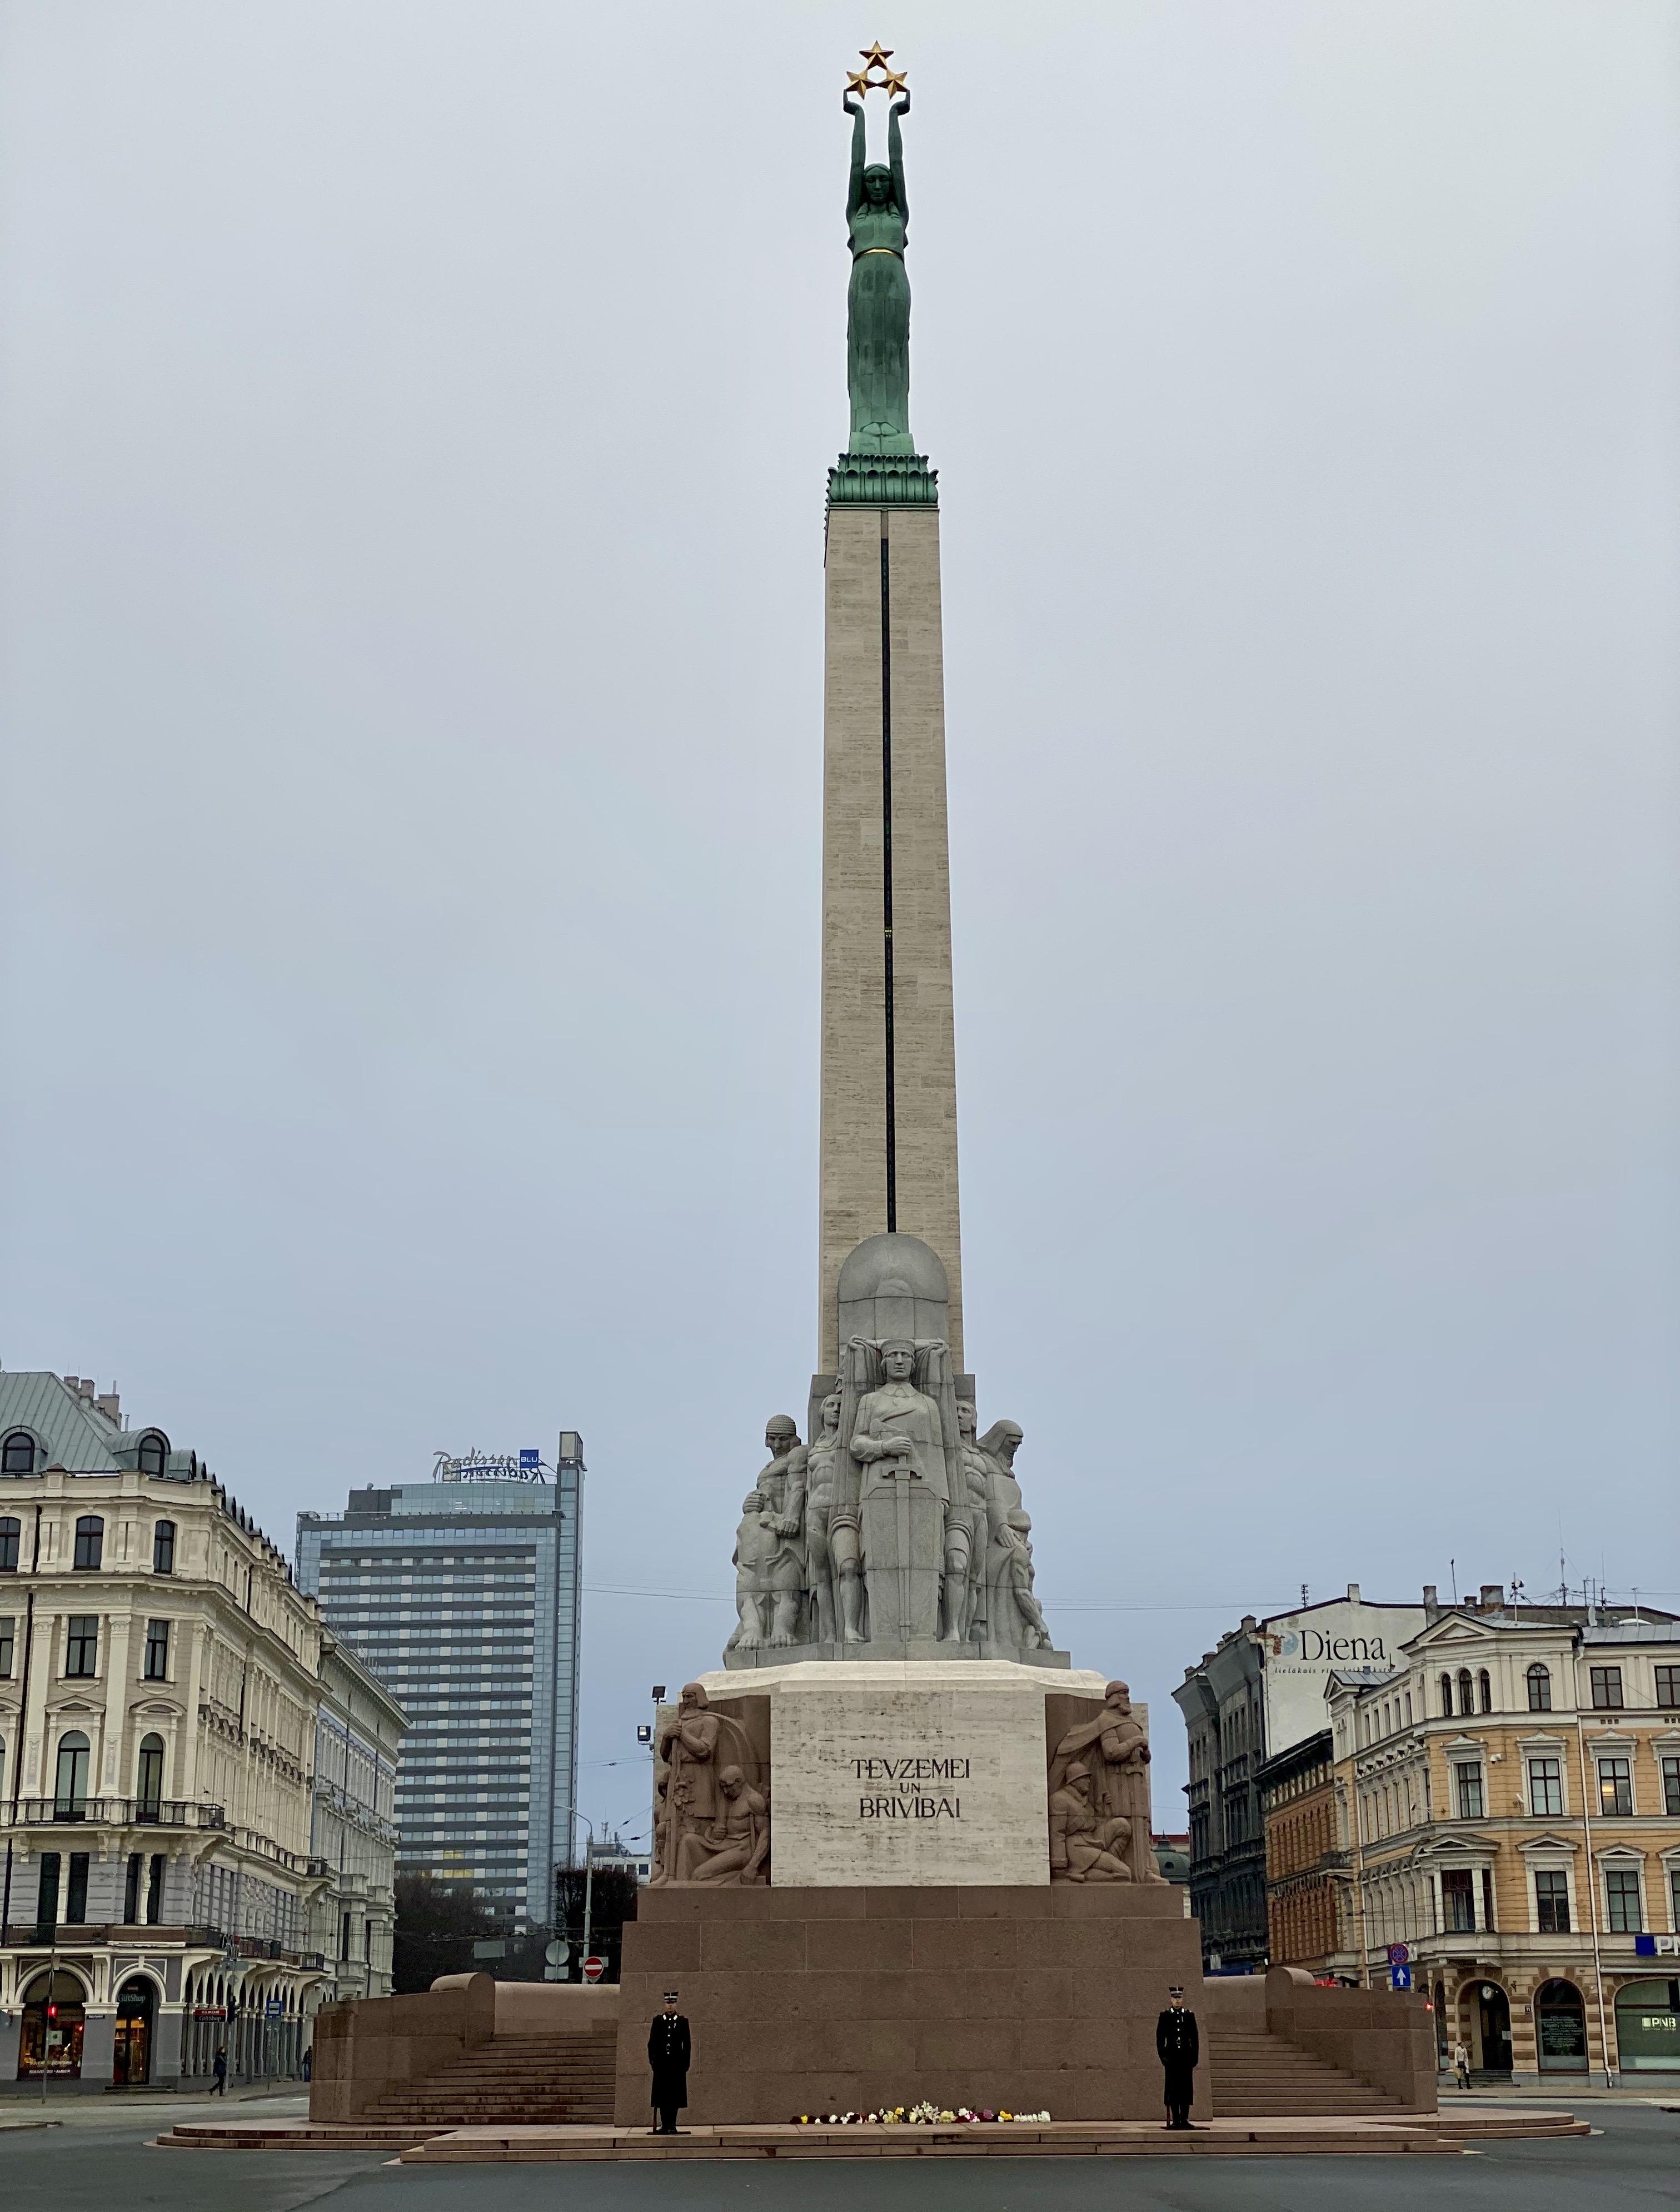 The Freedom Monument in Riga, Latvia.